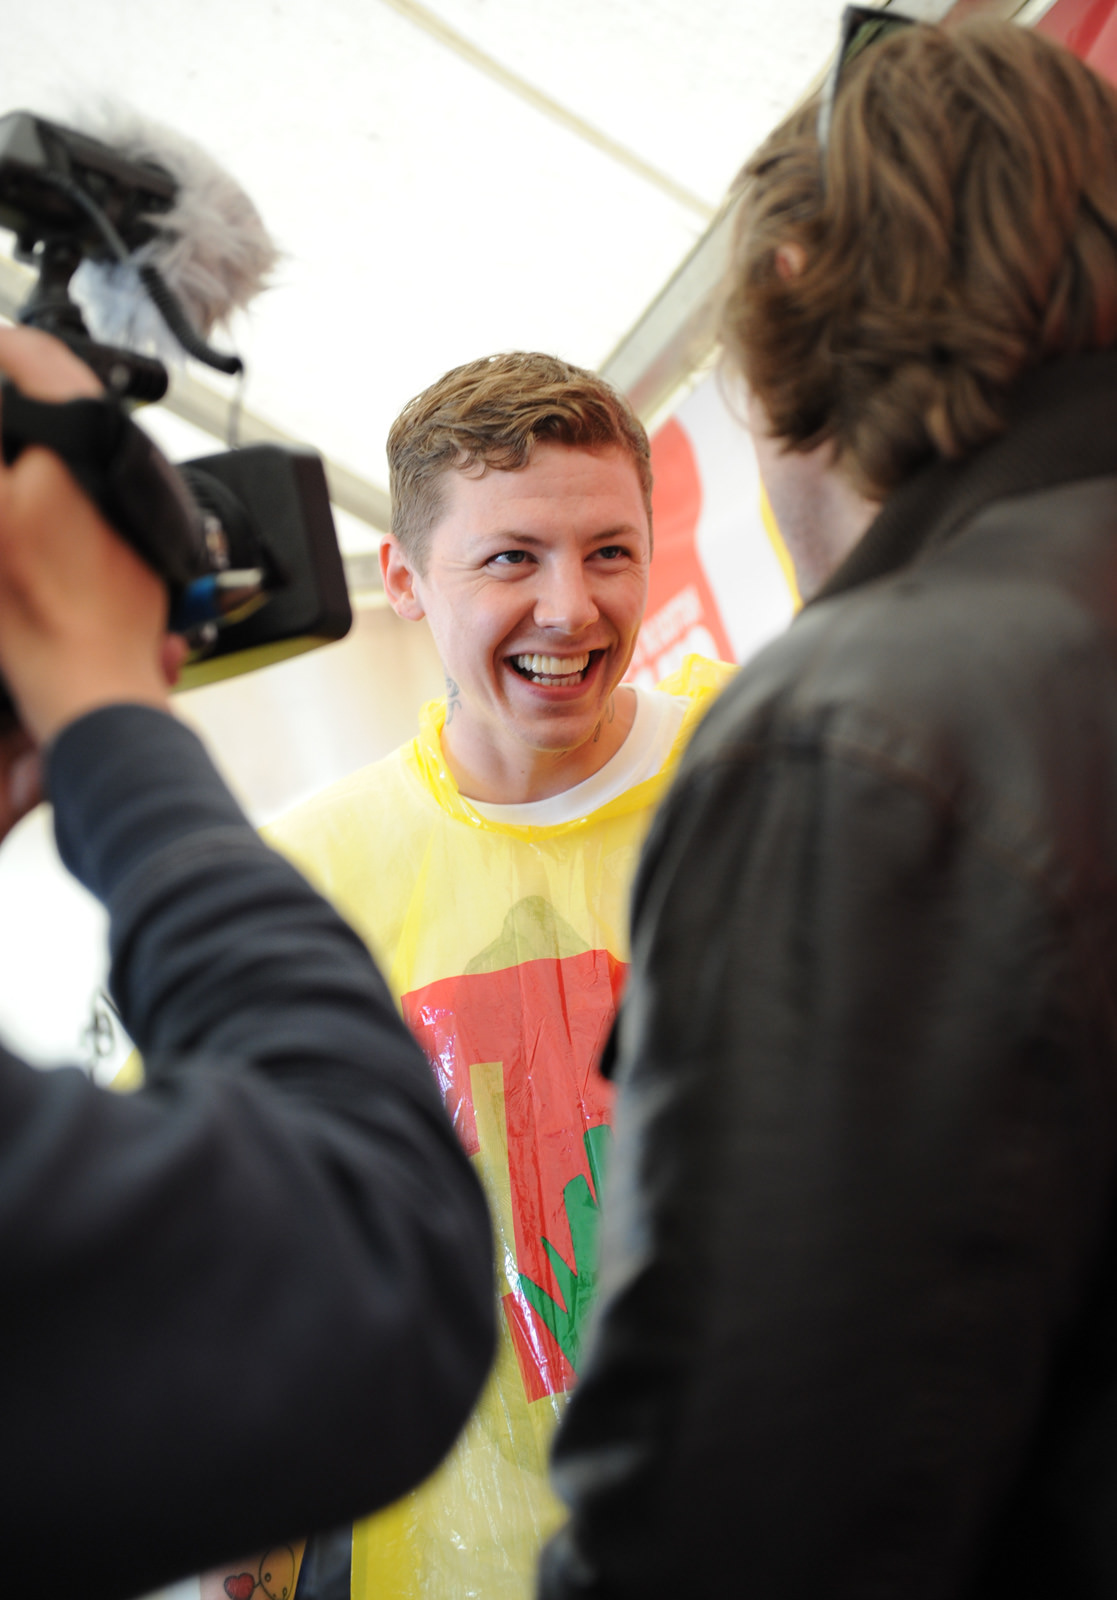 tinthepark-interview-bbc-professor-green-scotland.jpg